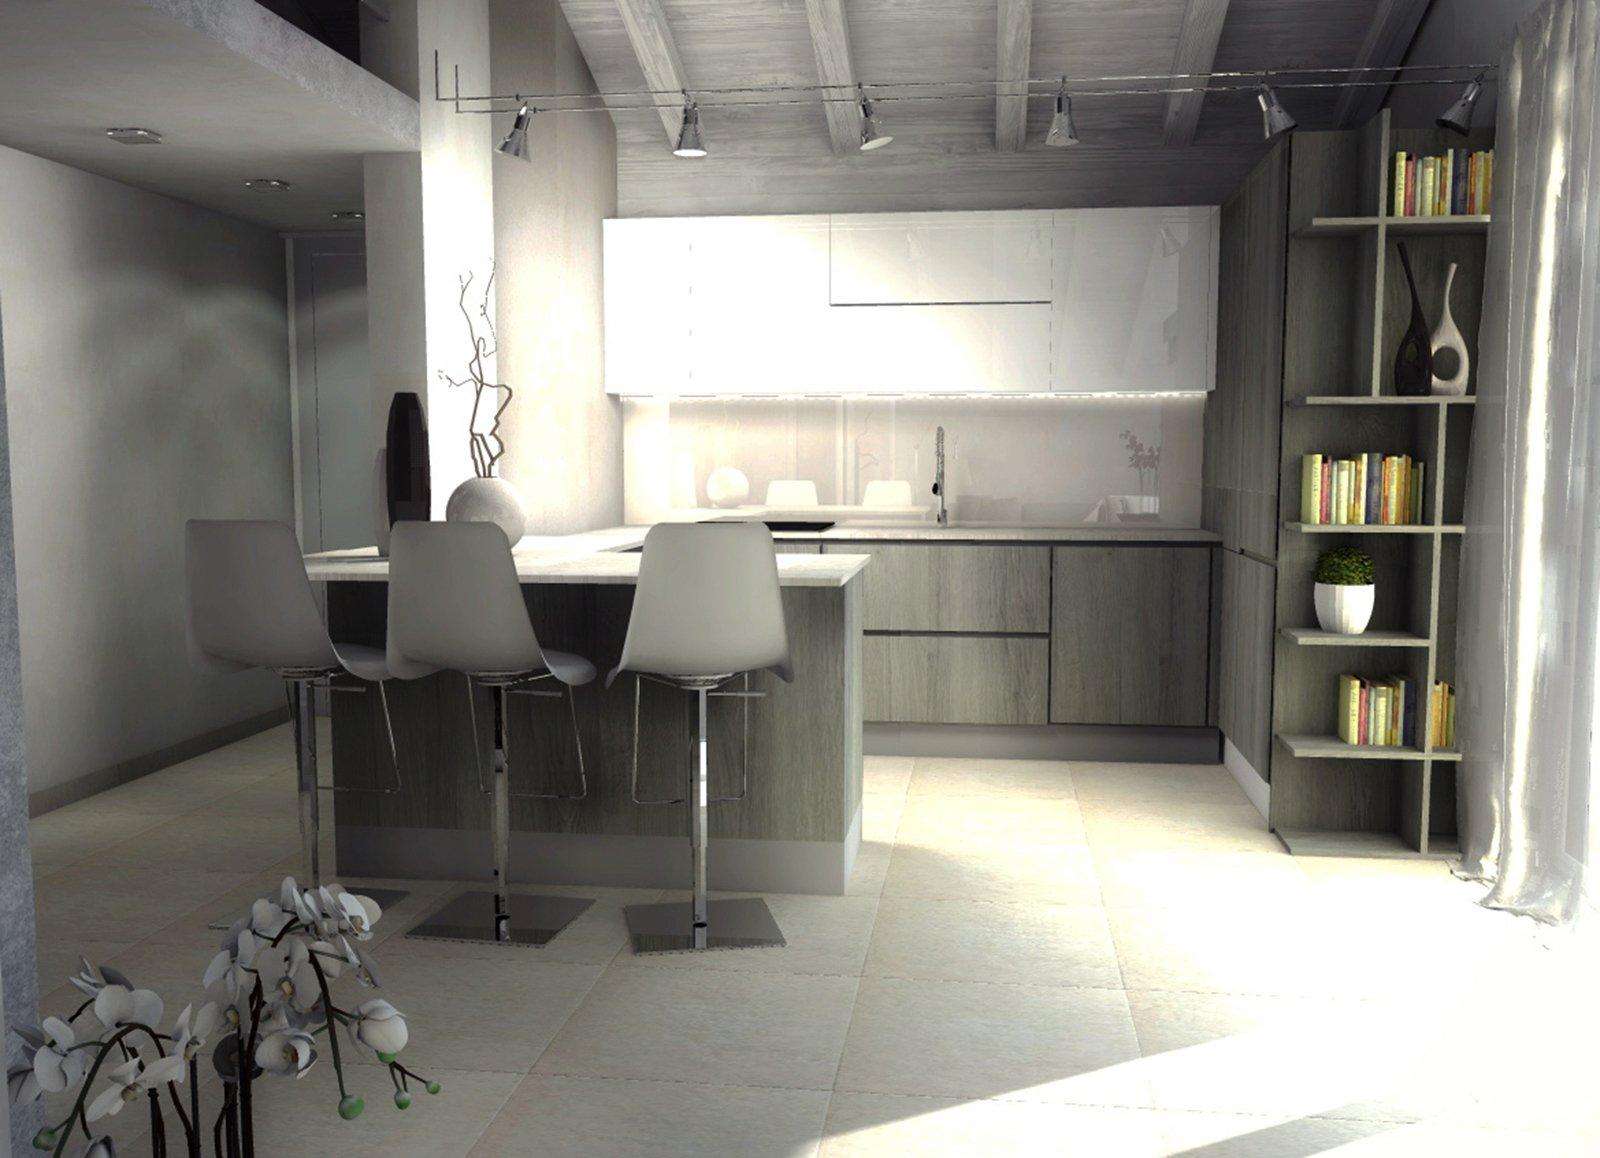 Interesting cucine per mansarde fabulous pauline la desiderava una cucina with cucine per mansarde - Cucine per mansarde basse ...